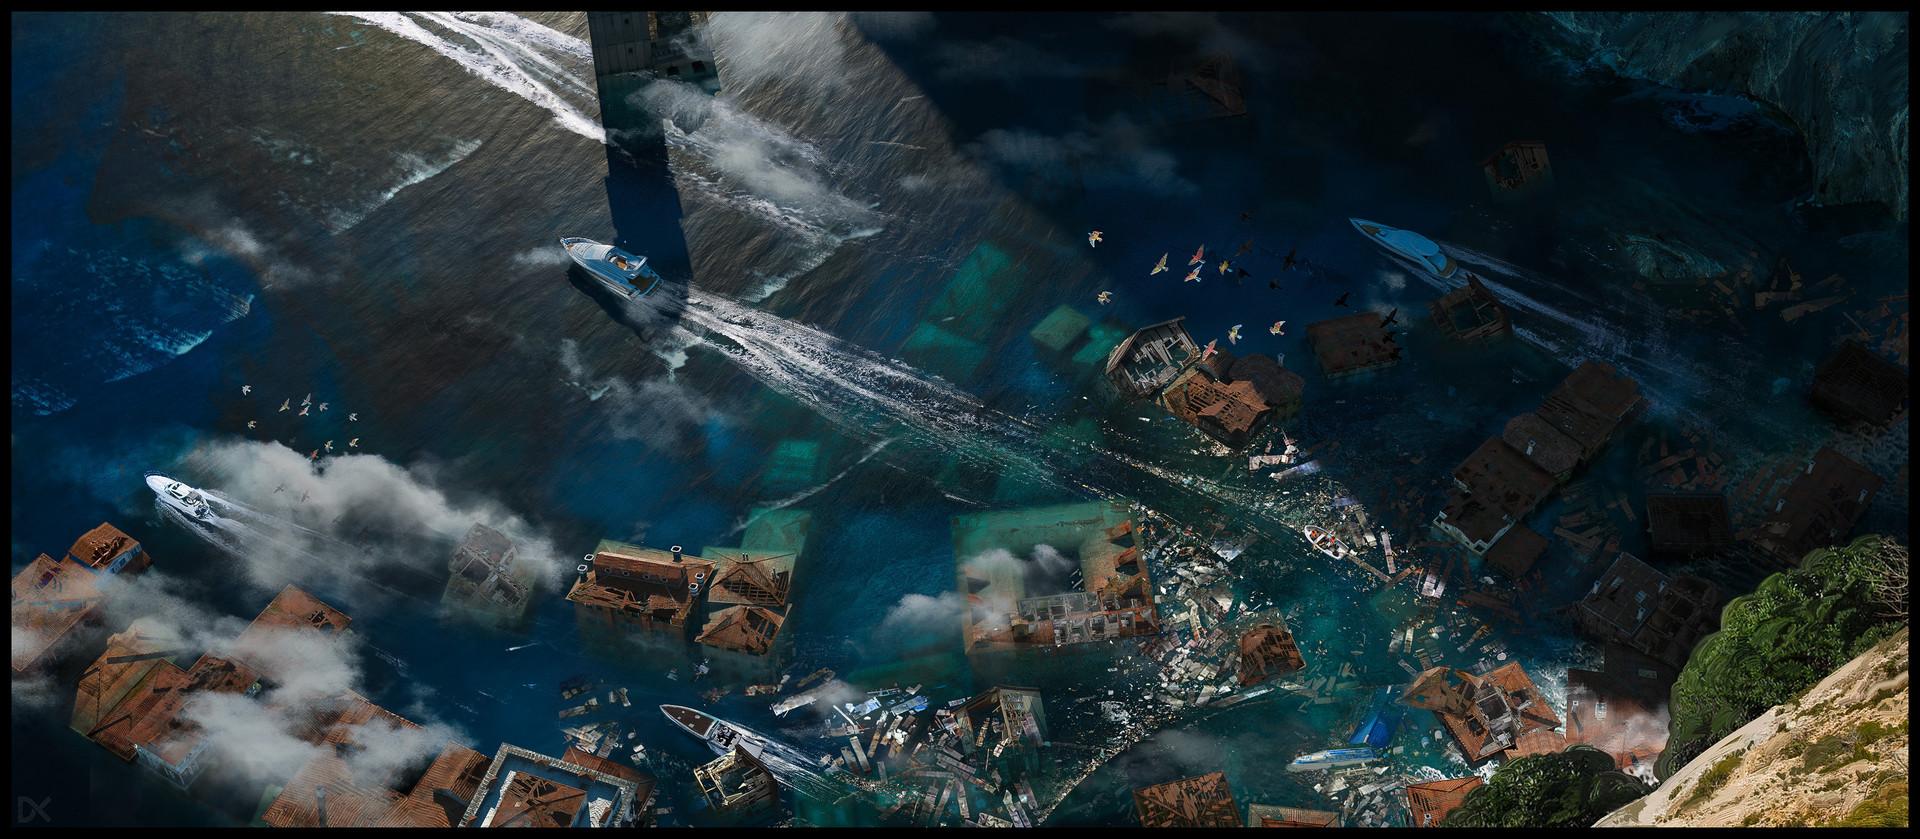 Darius kalinauskas enrironment concept art disaster tripic boats